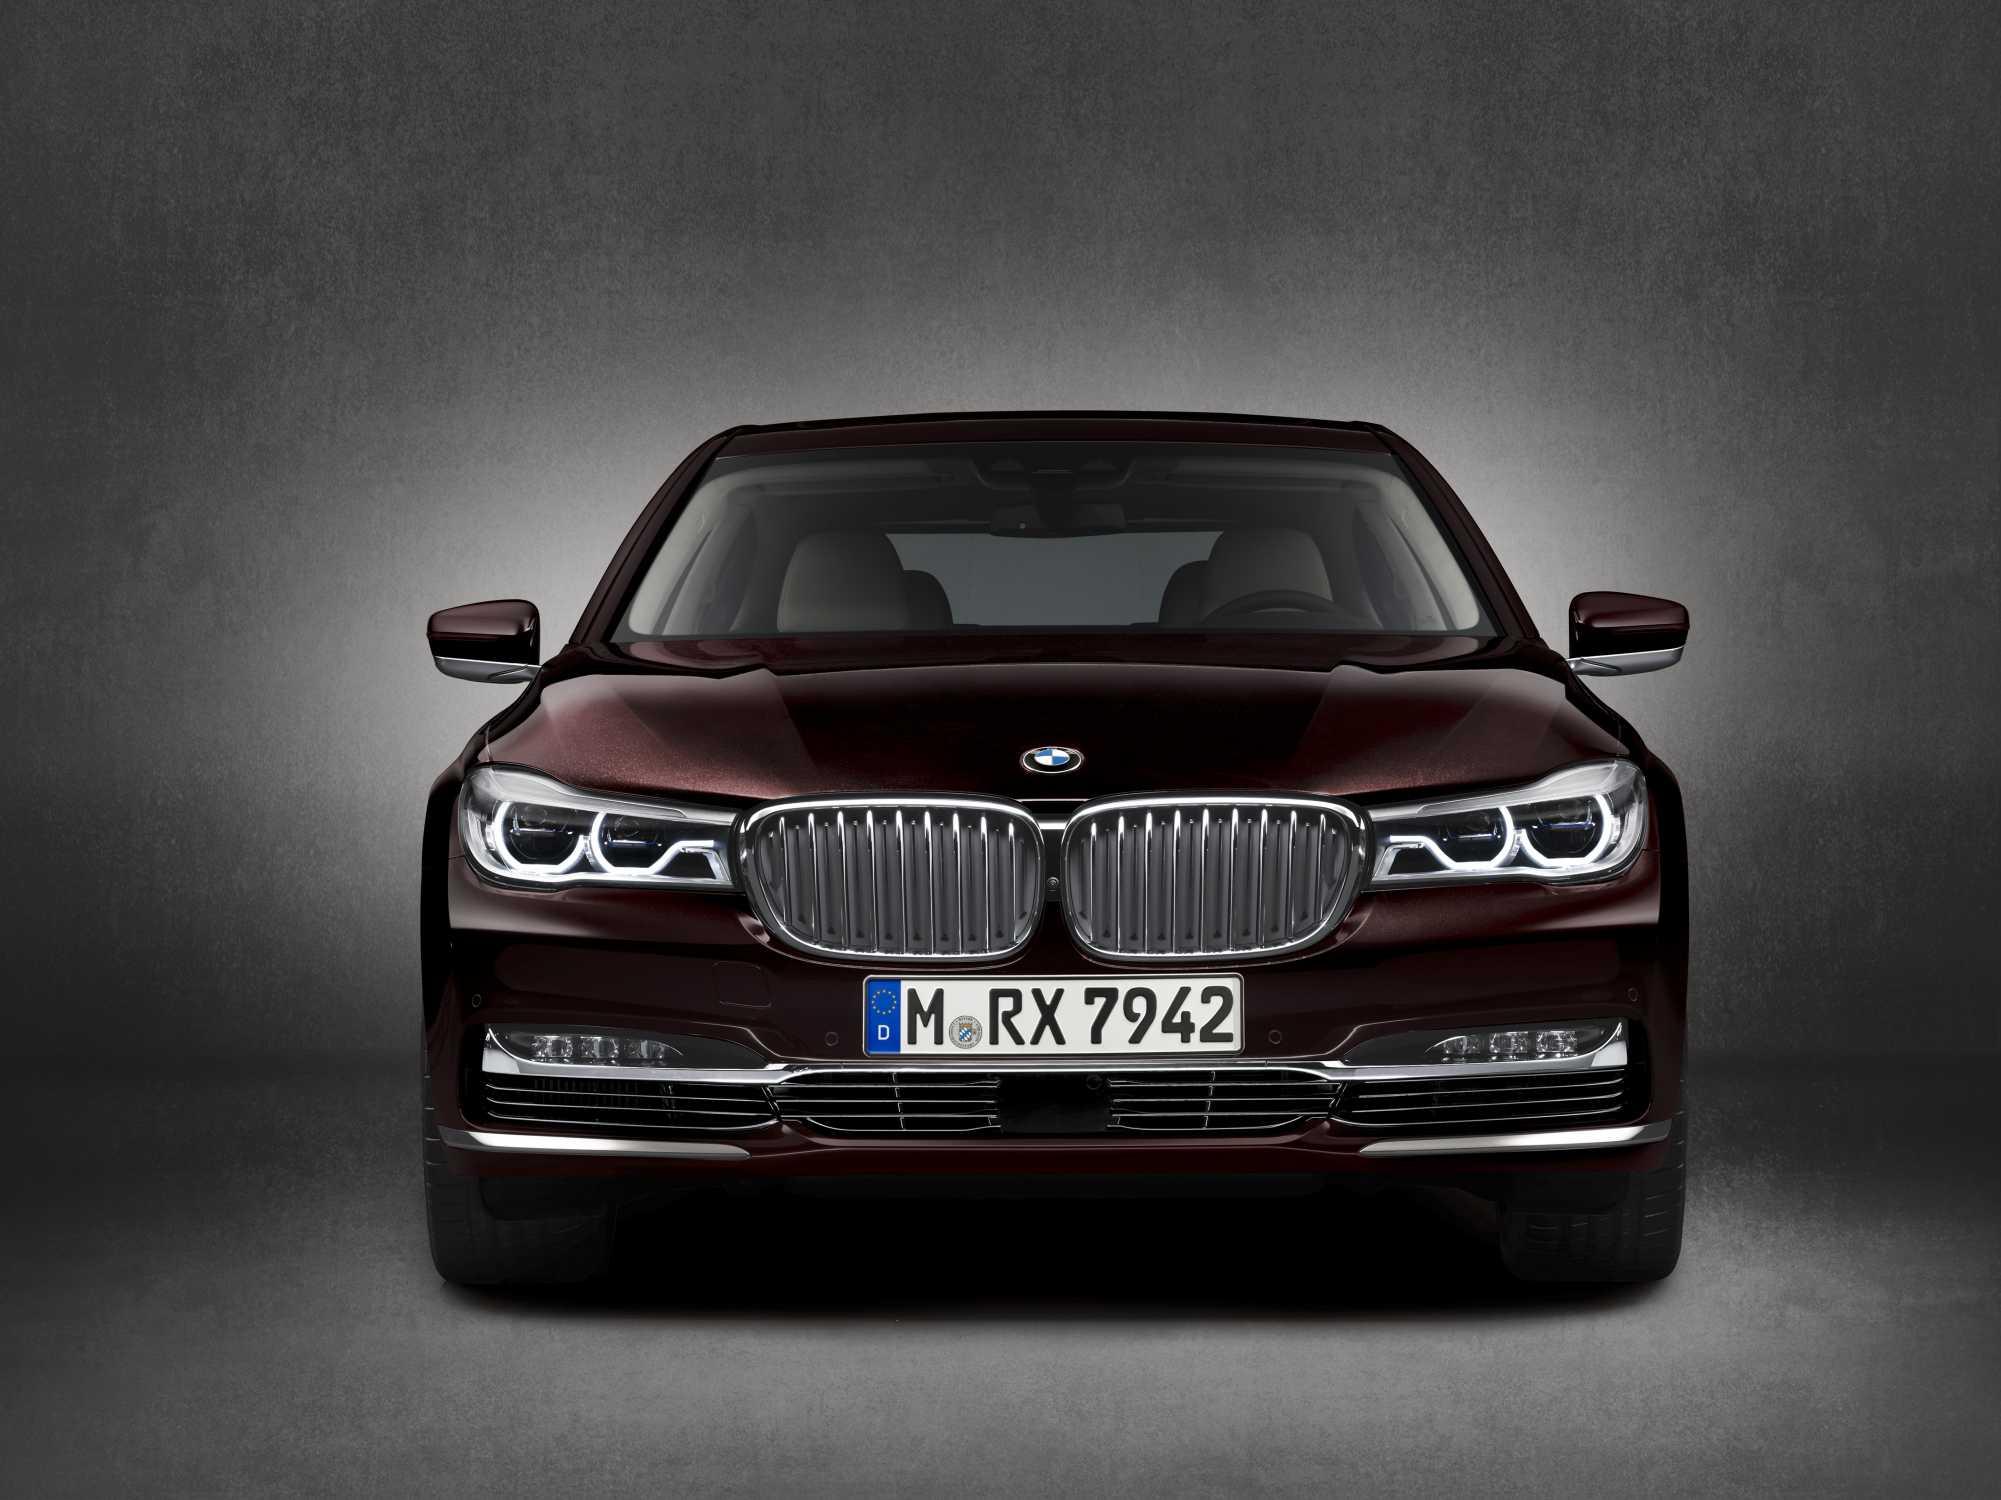 BMW M760Li xDrive Model V12 Excellence - Exterior - BMW ...